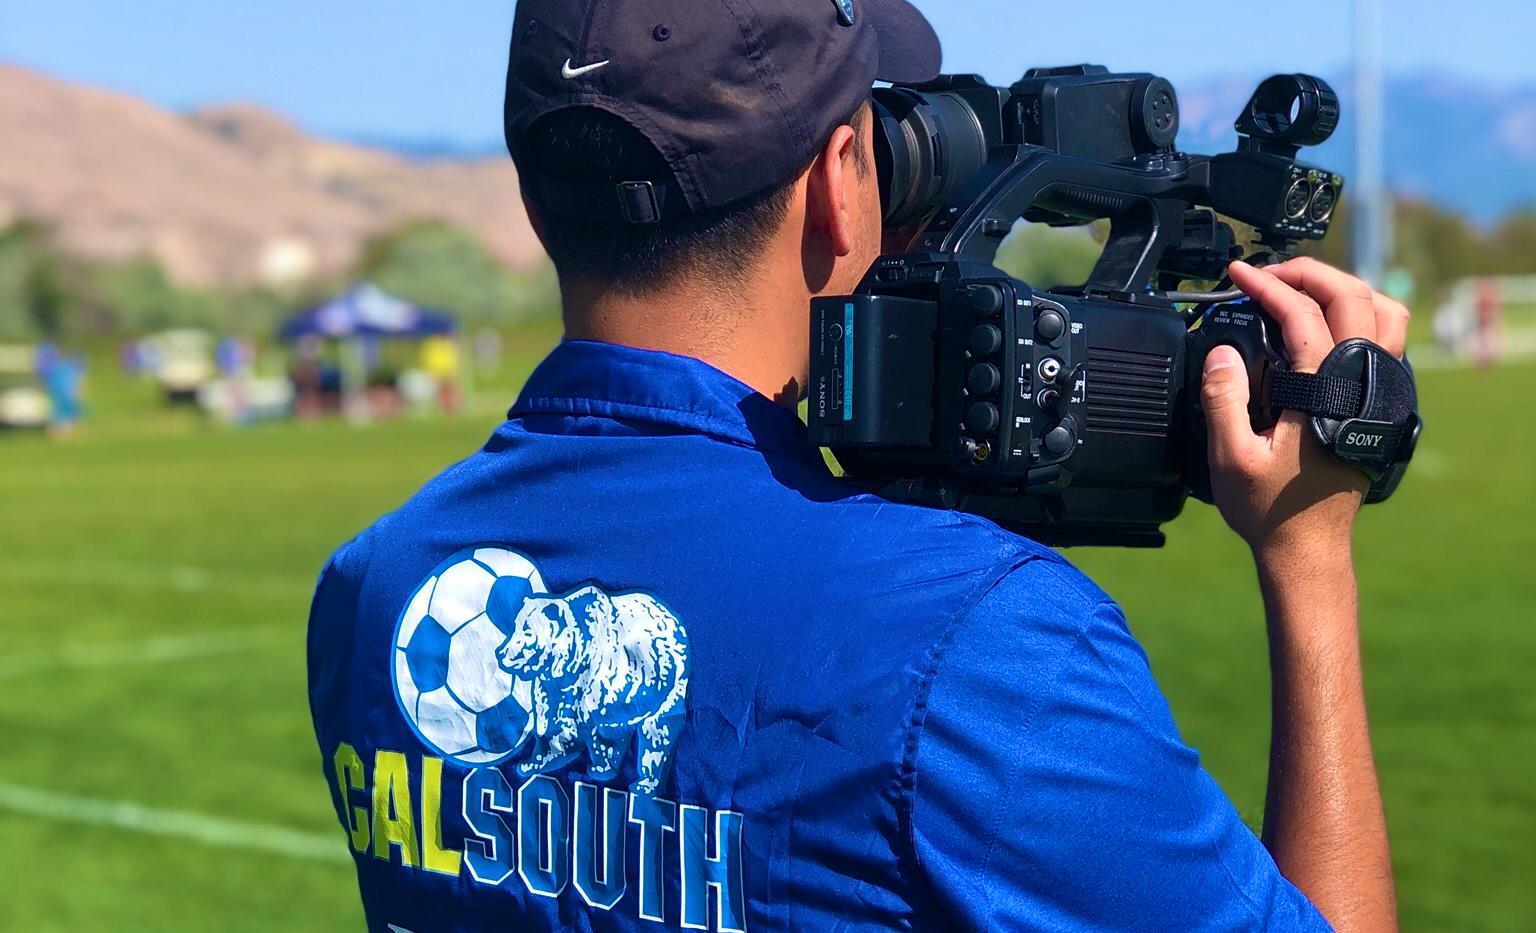 Lead Videographer (Cal South)